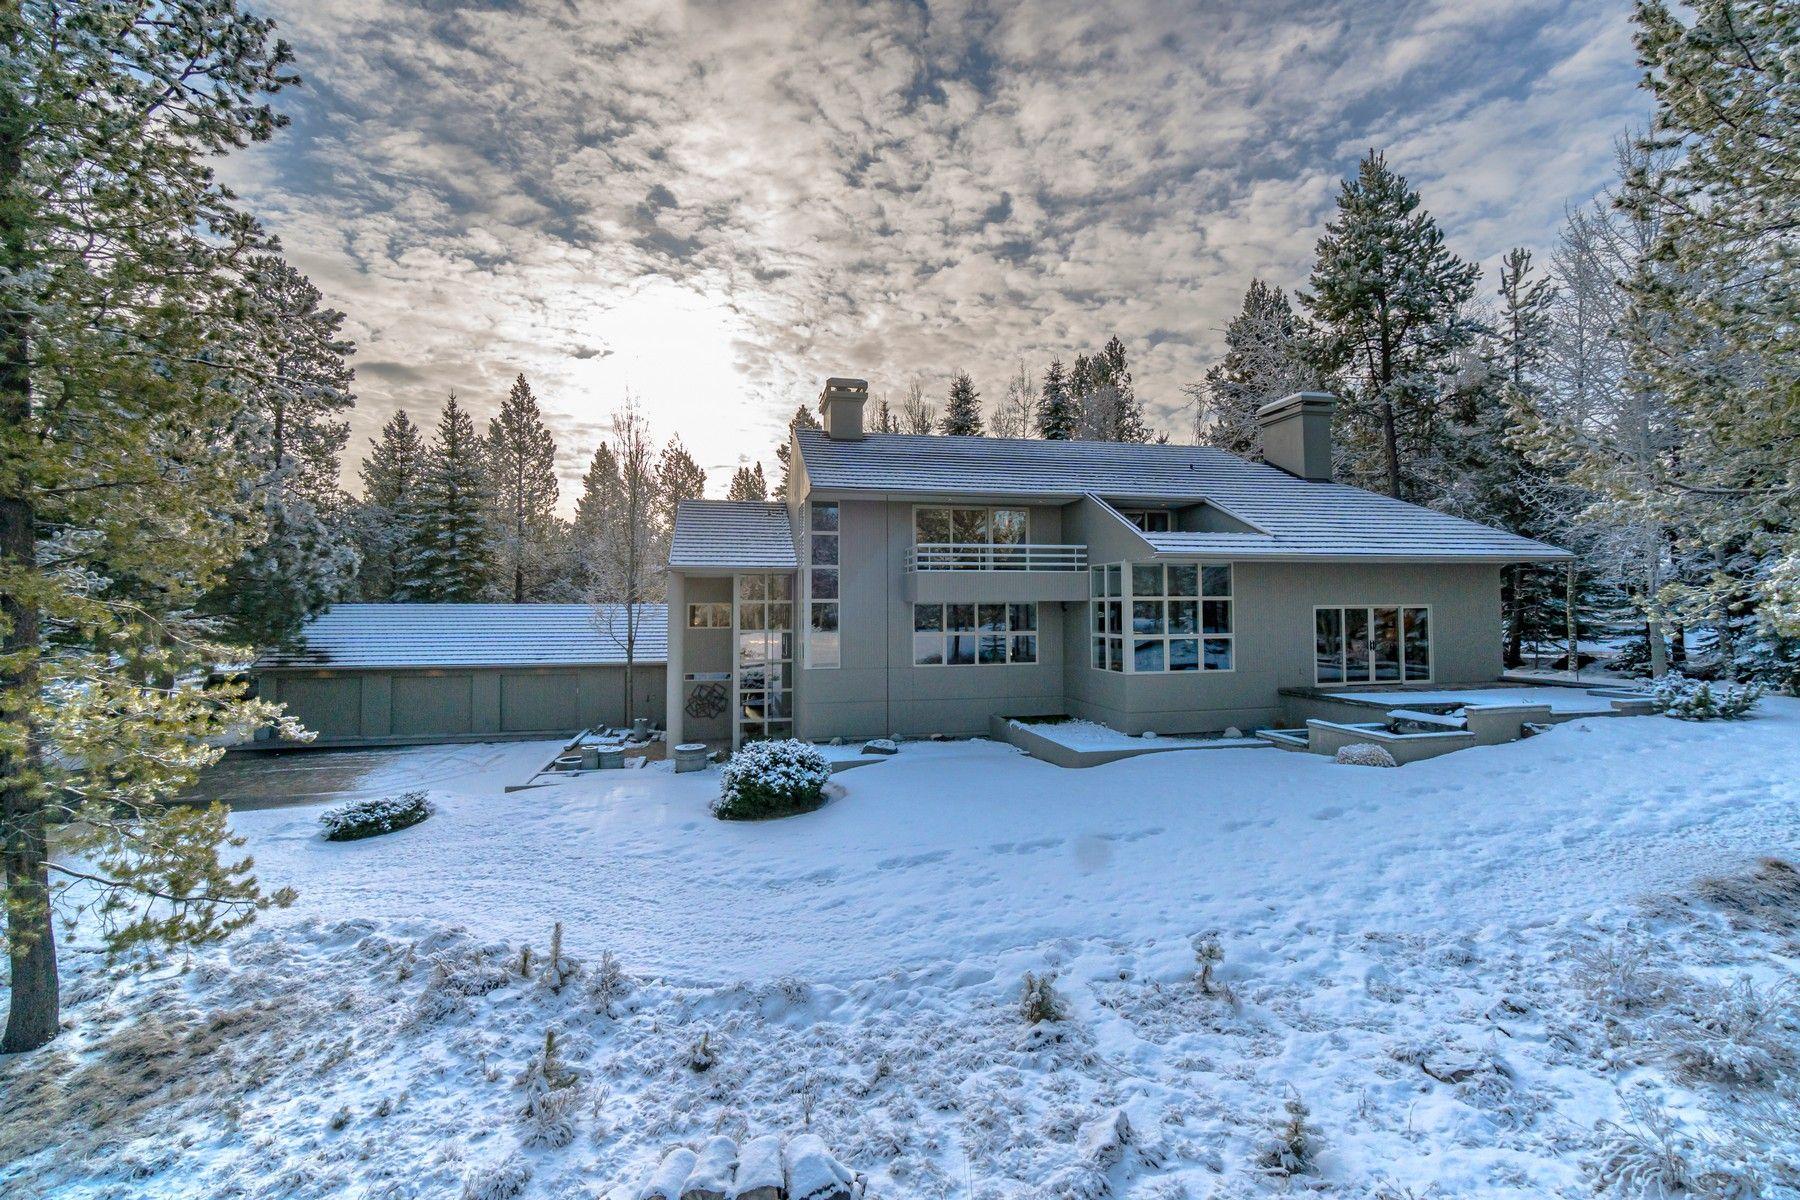 Other Residential Homes για την Πώληση στο 57701 Cottonwood Lane 26 Sunriver, OR 97707 57701-26 Cottonwood Lane, Sunriver, Ορεγκον 97707 Ηνωμένες Πολιτείες